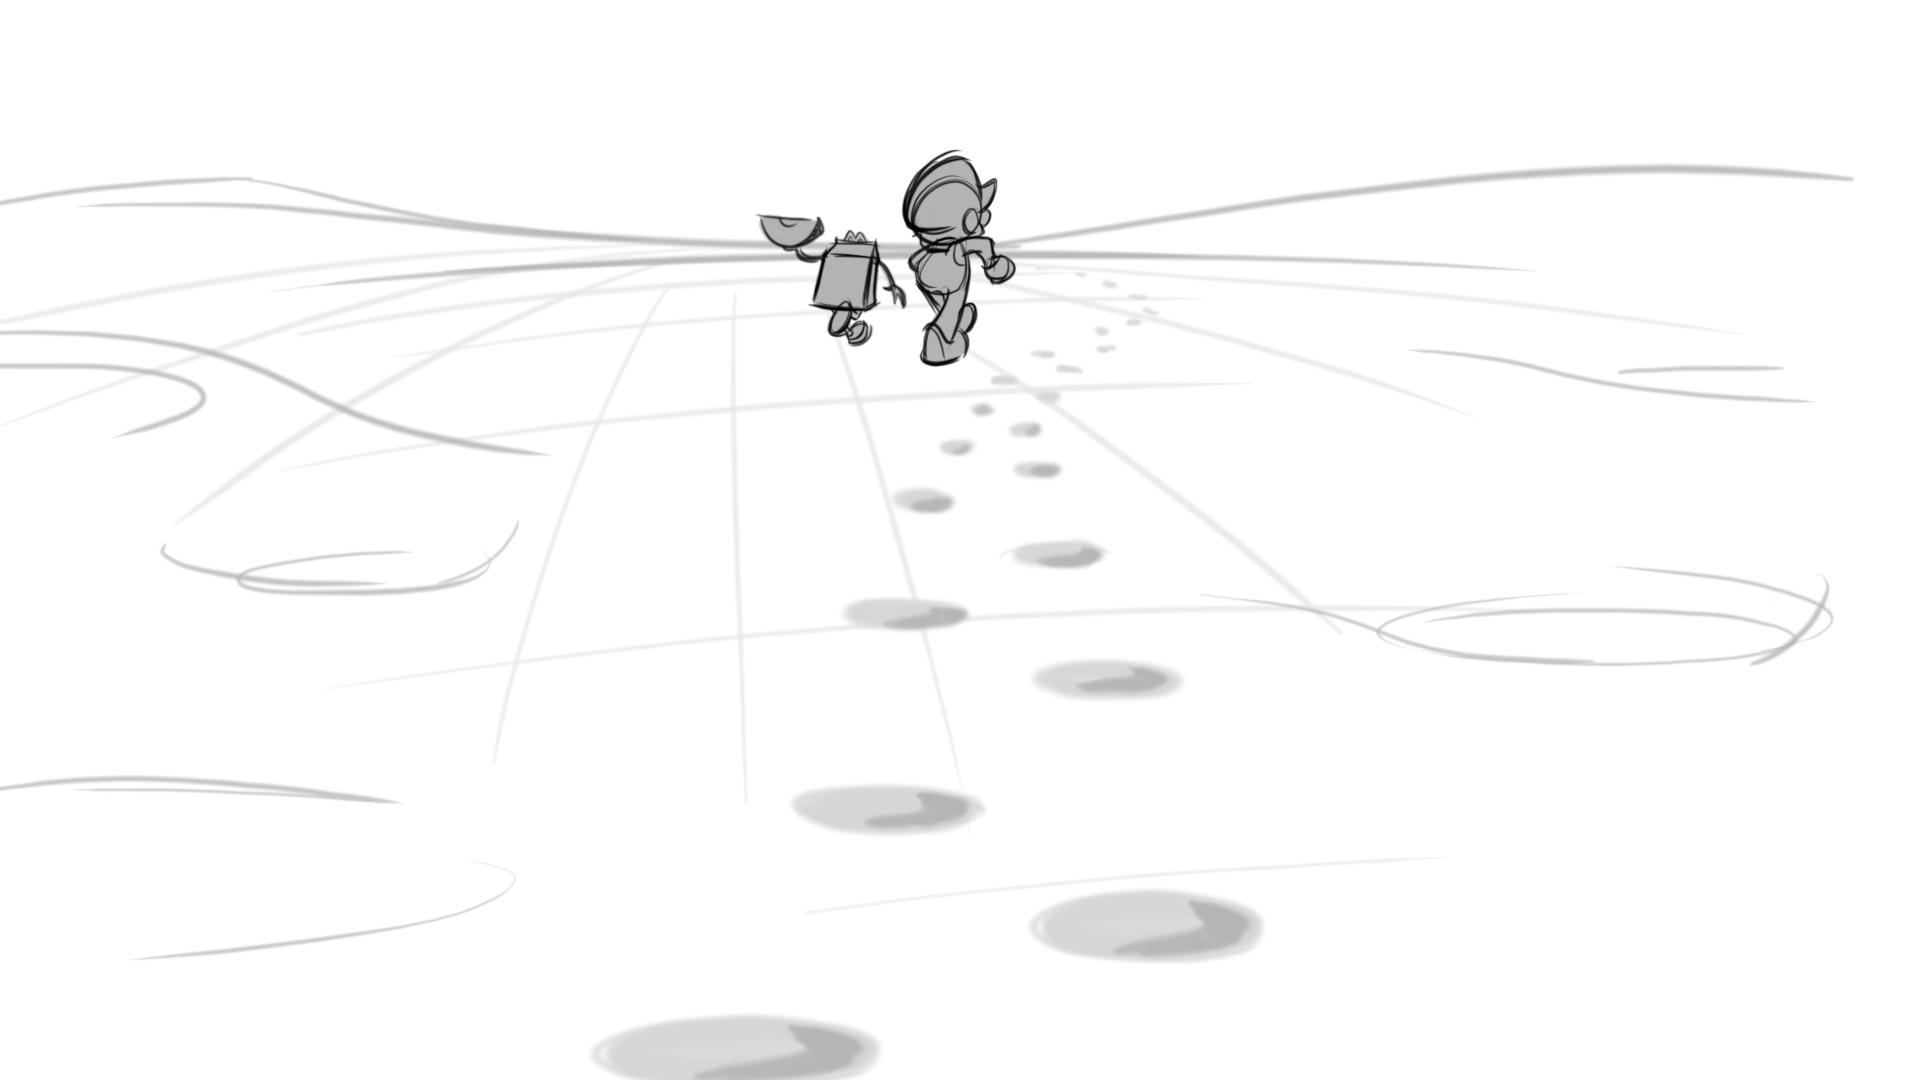 Mario-14-03.jpg